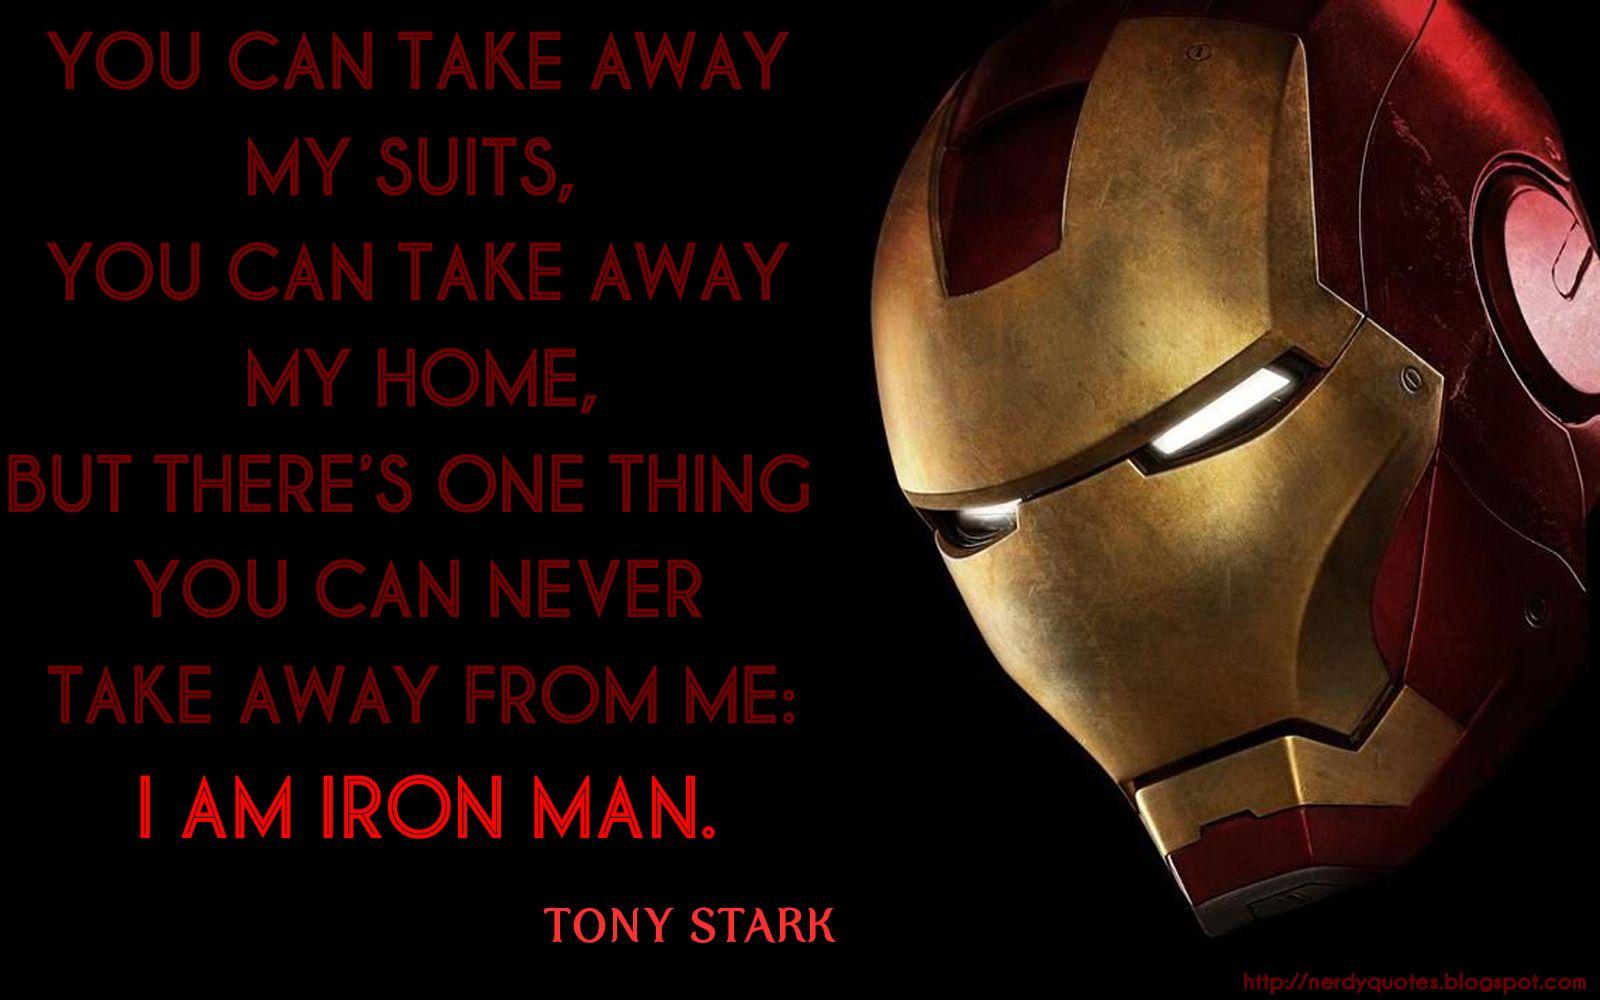 Best Iron Man Quotes Iron Man 3 Quotes | Movie Quotes | Iron Man, Superhero, Iron man  Best Iron Man Quotes